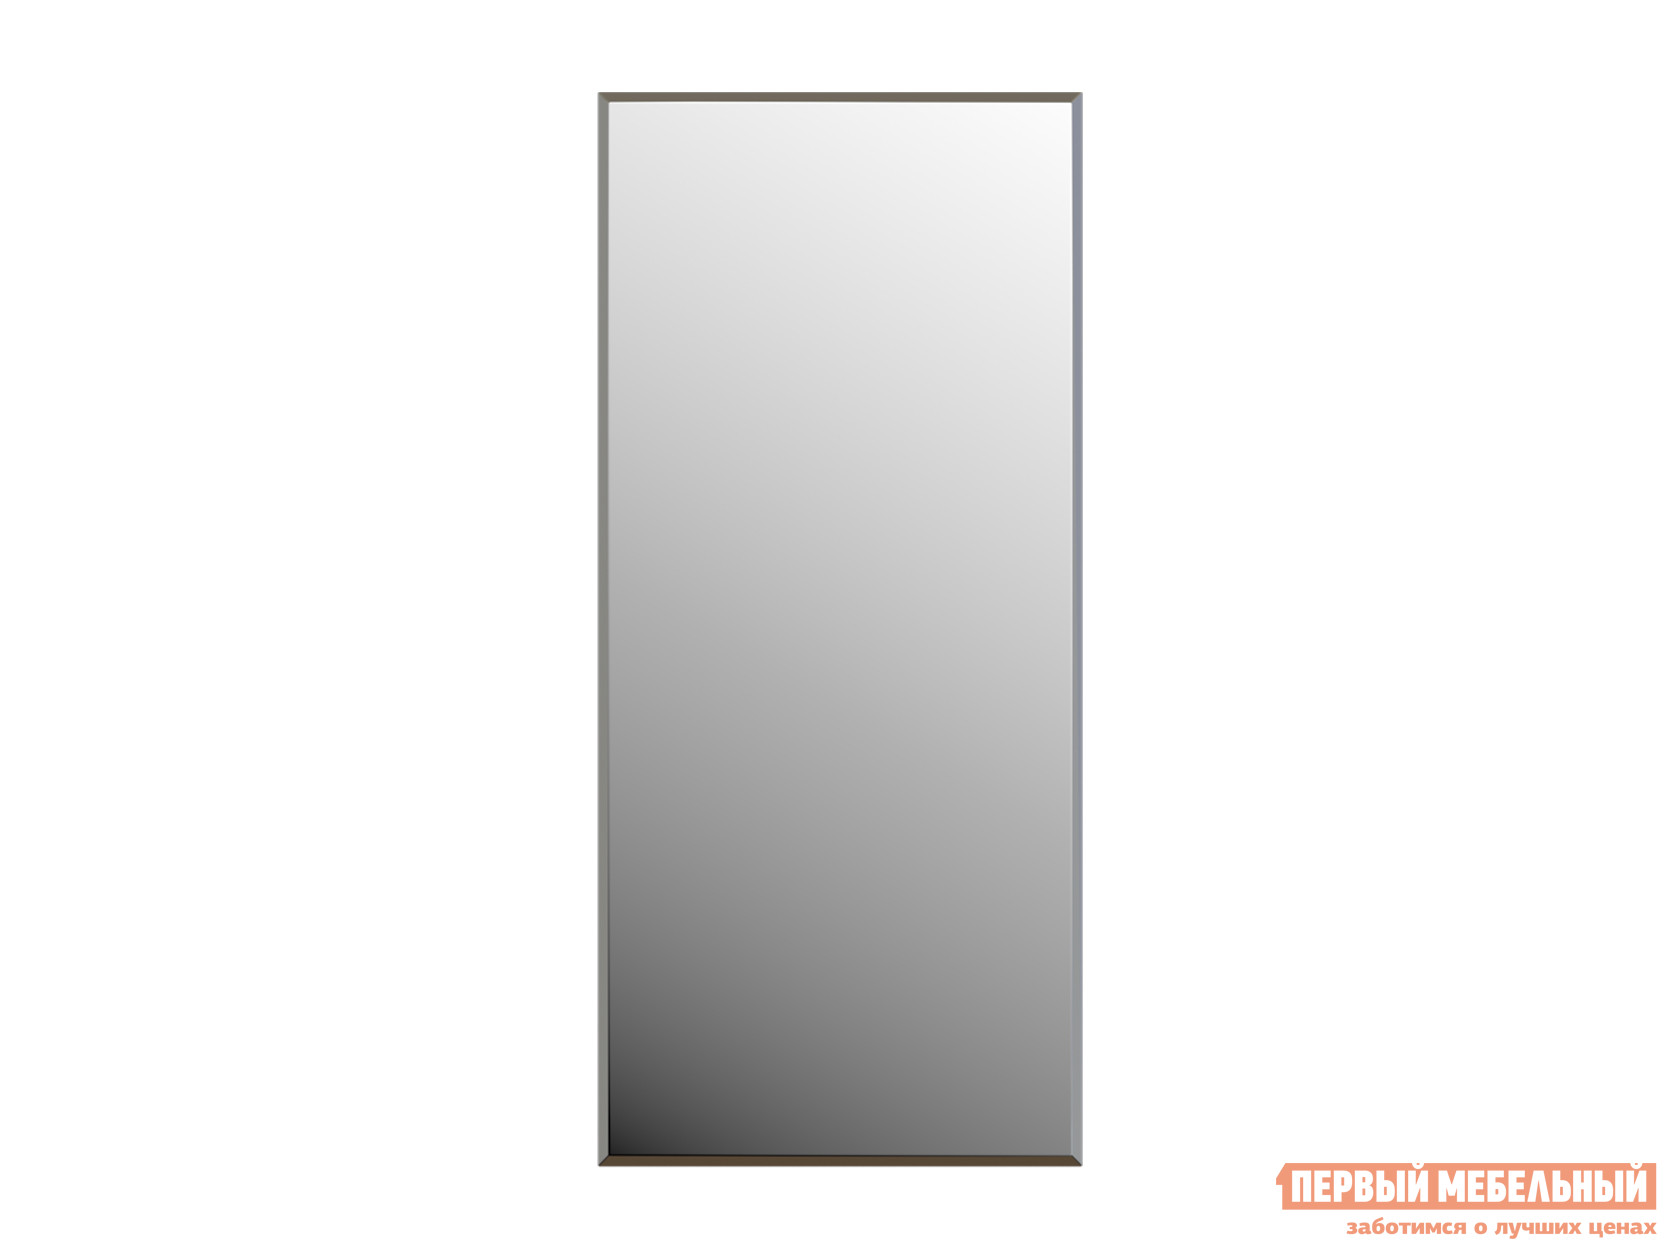 Настенное зеркало Мебелик Зеркало настенное Сельетта-2 (1000х500х4 фацет 10 мм) зеркало настенное home philosophy male collection 70379